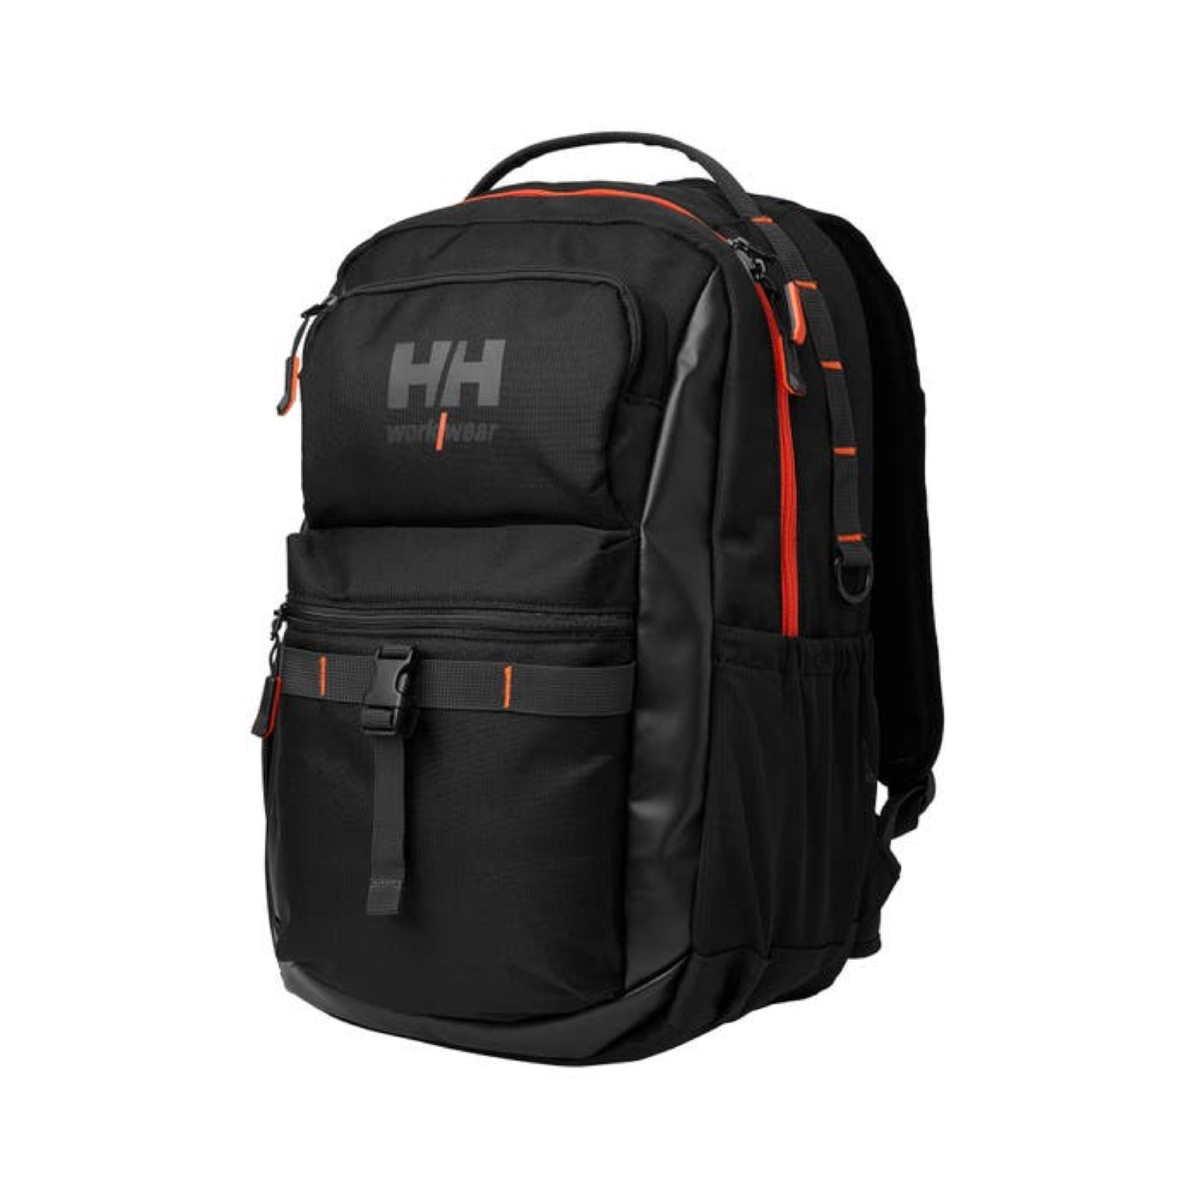 DK7958 Work Day Backpack